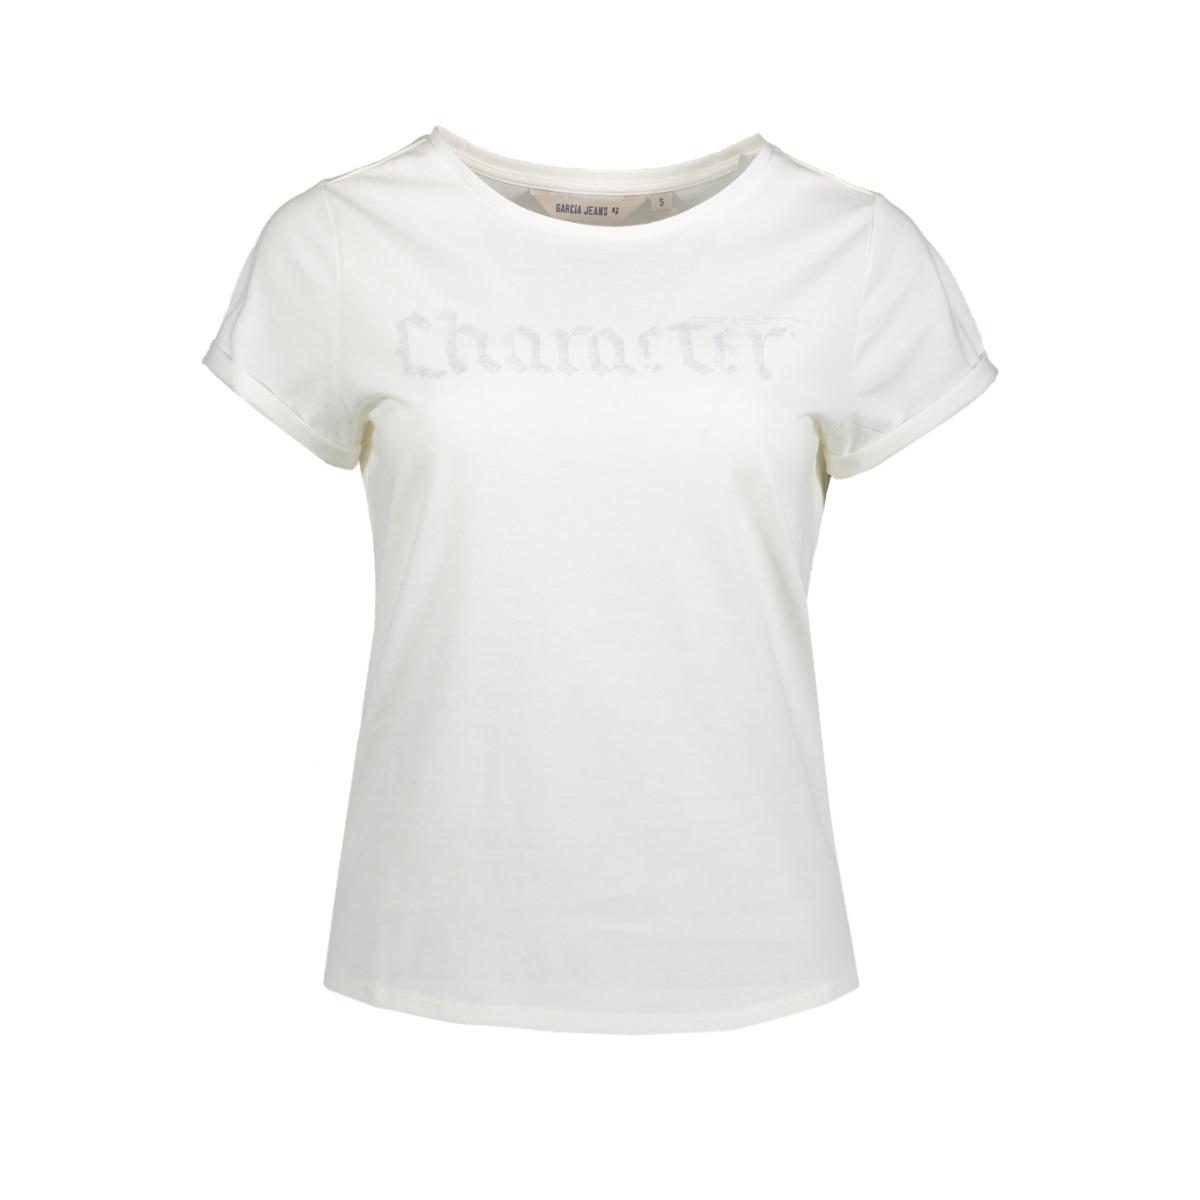 g70002 garcia t-shirt 53 off white